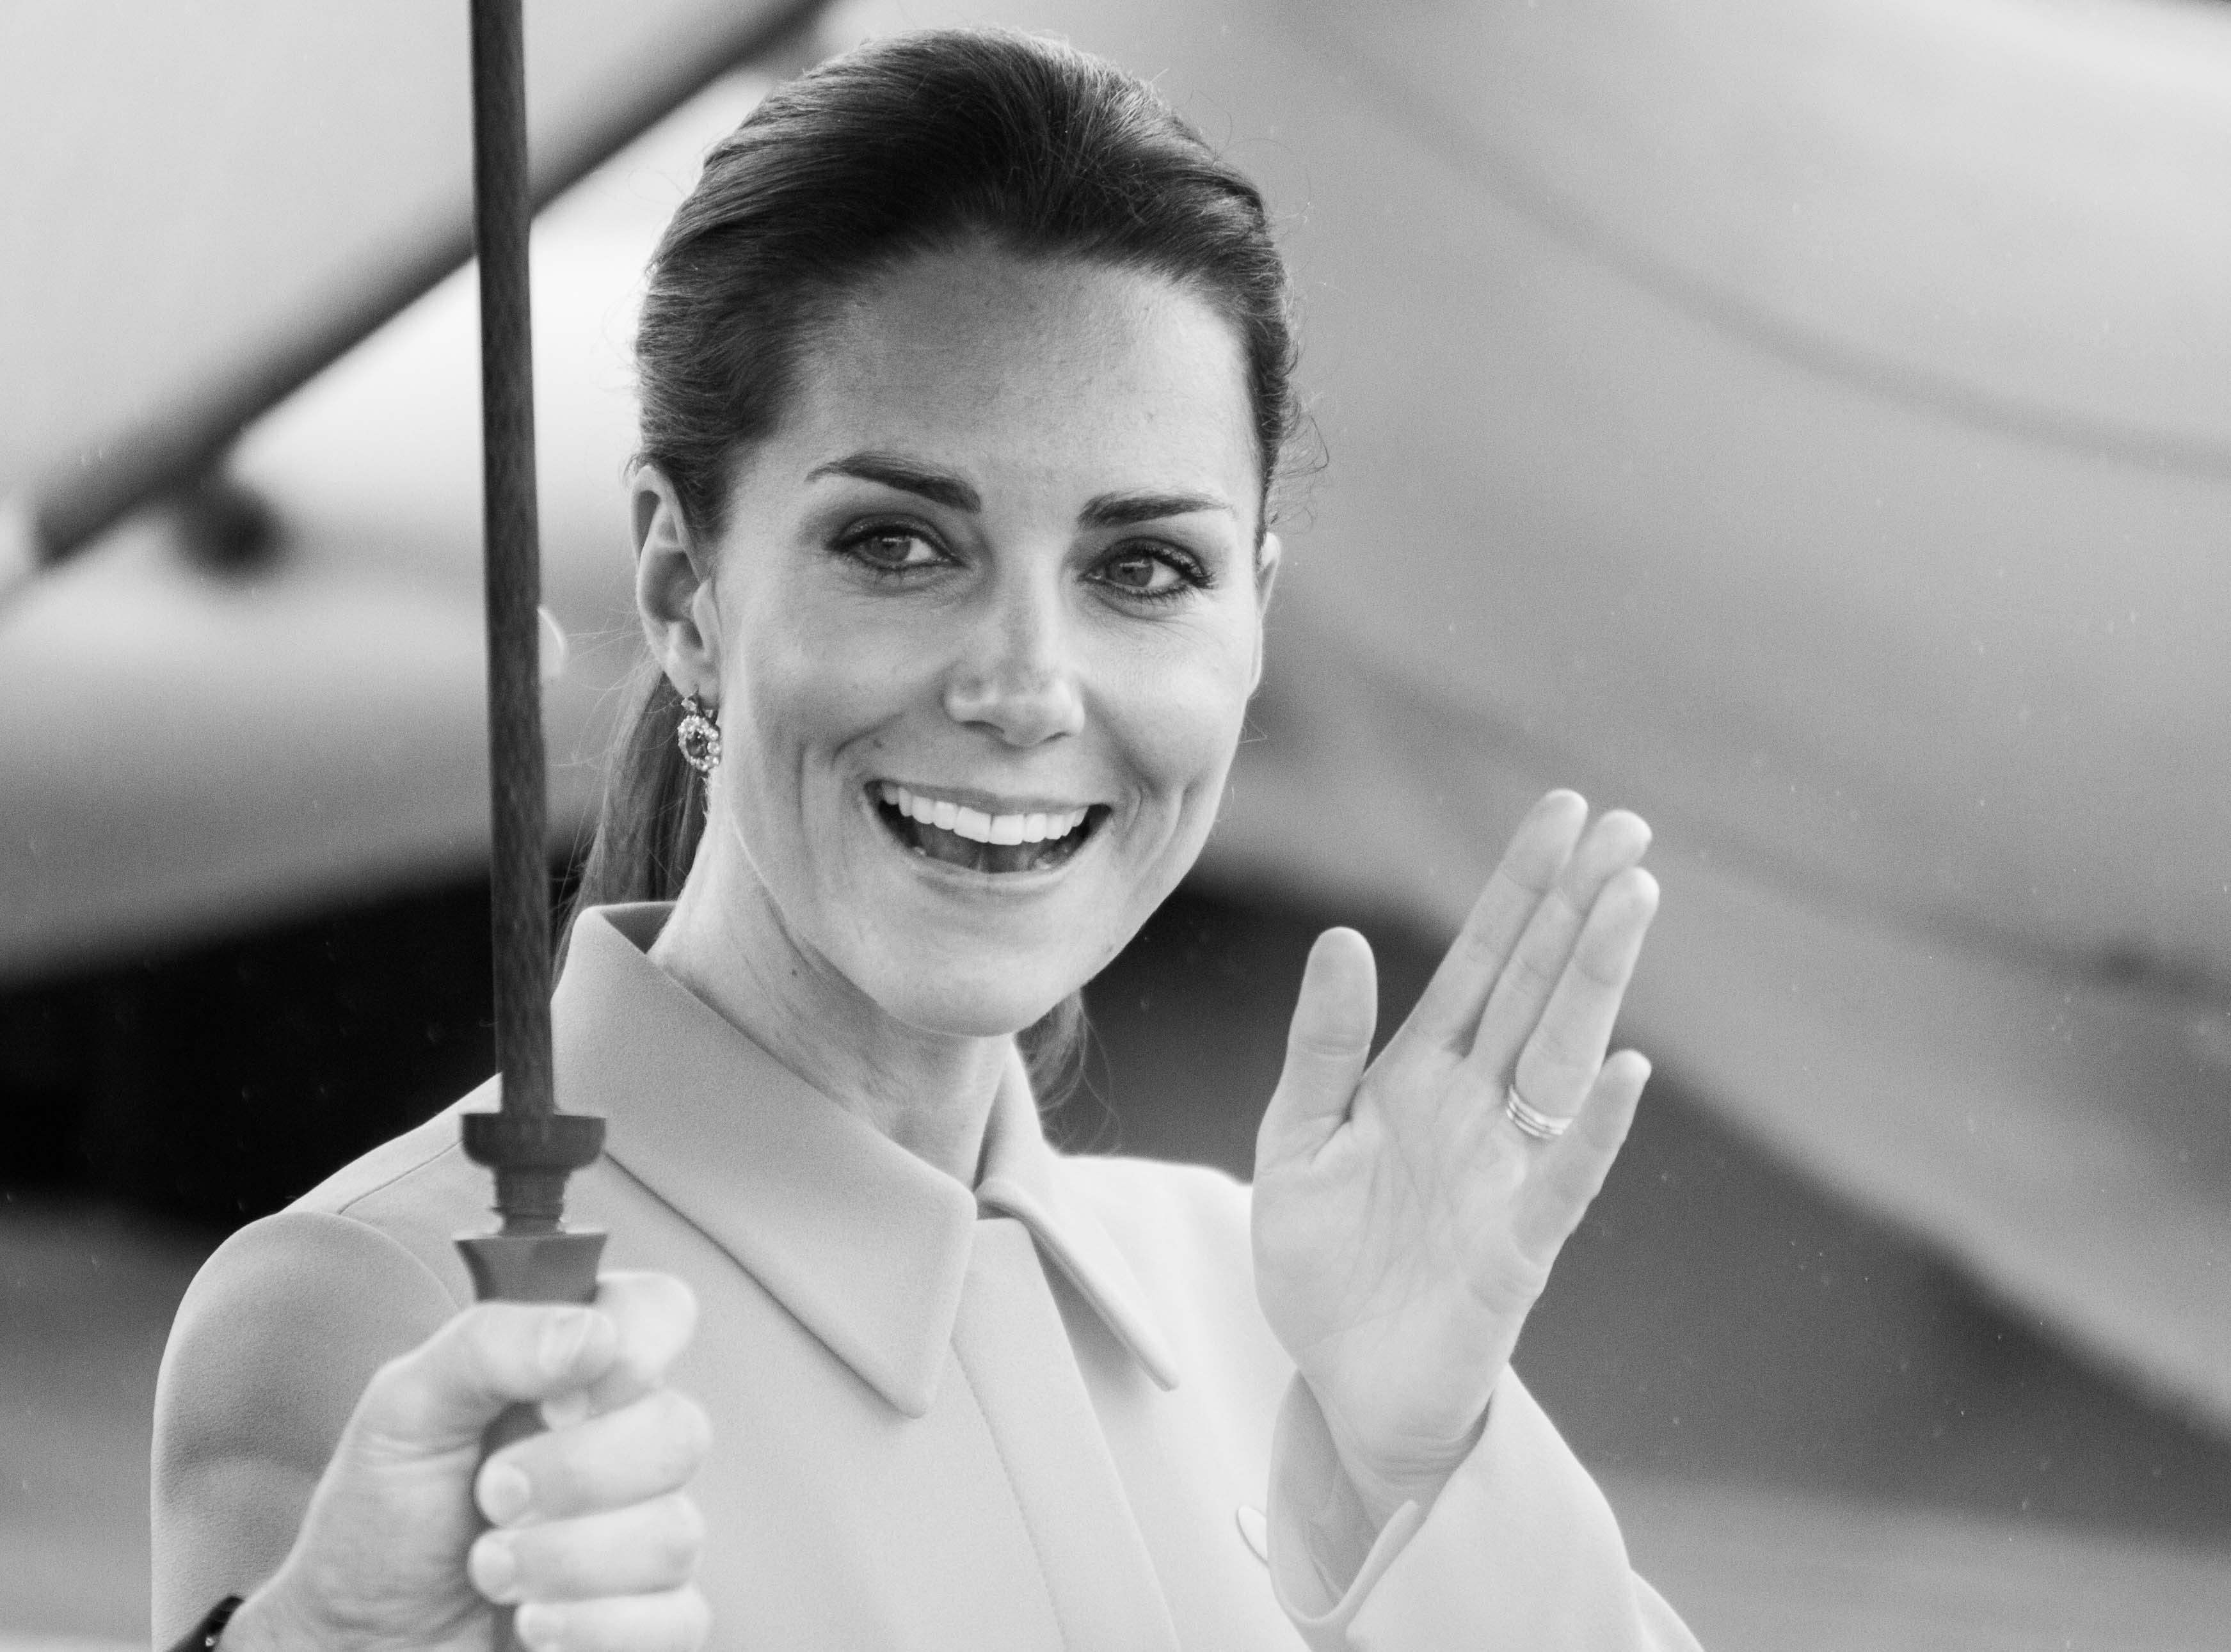 The Duchess of Cambridge Kate Middleton. Photo: Wikimedia Commons.